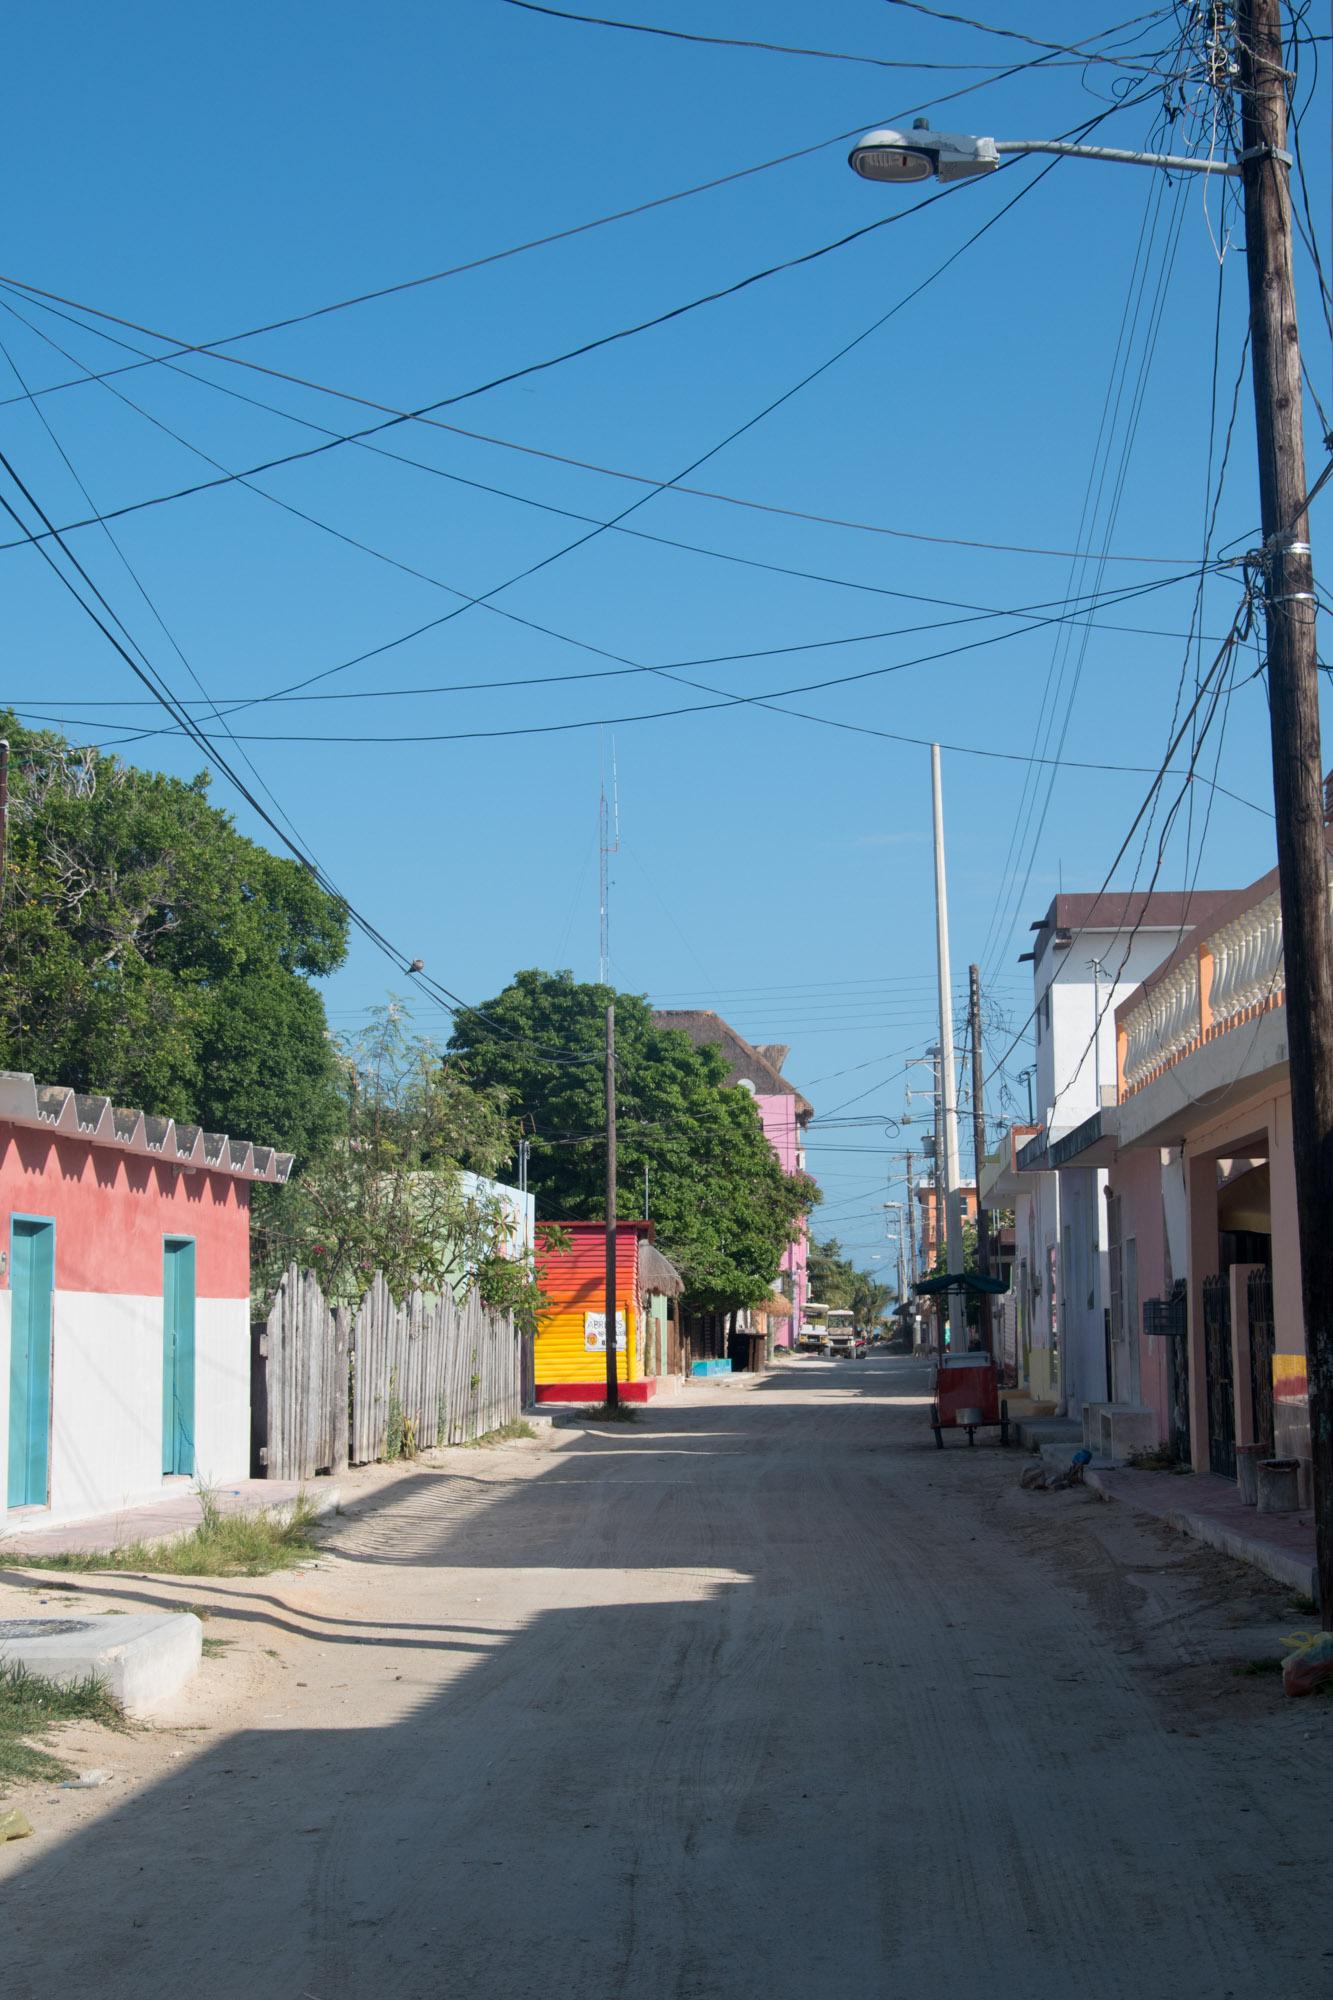 hotbox-streets-island-life